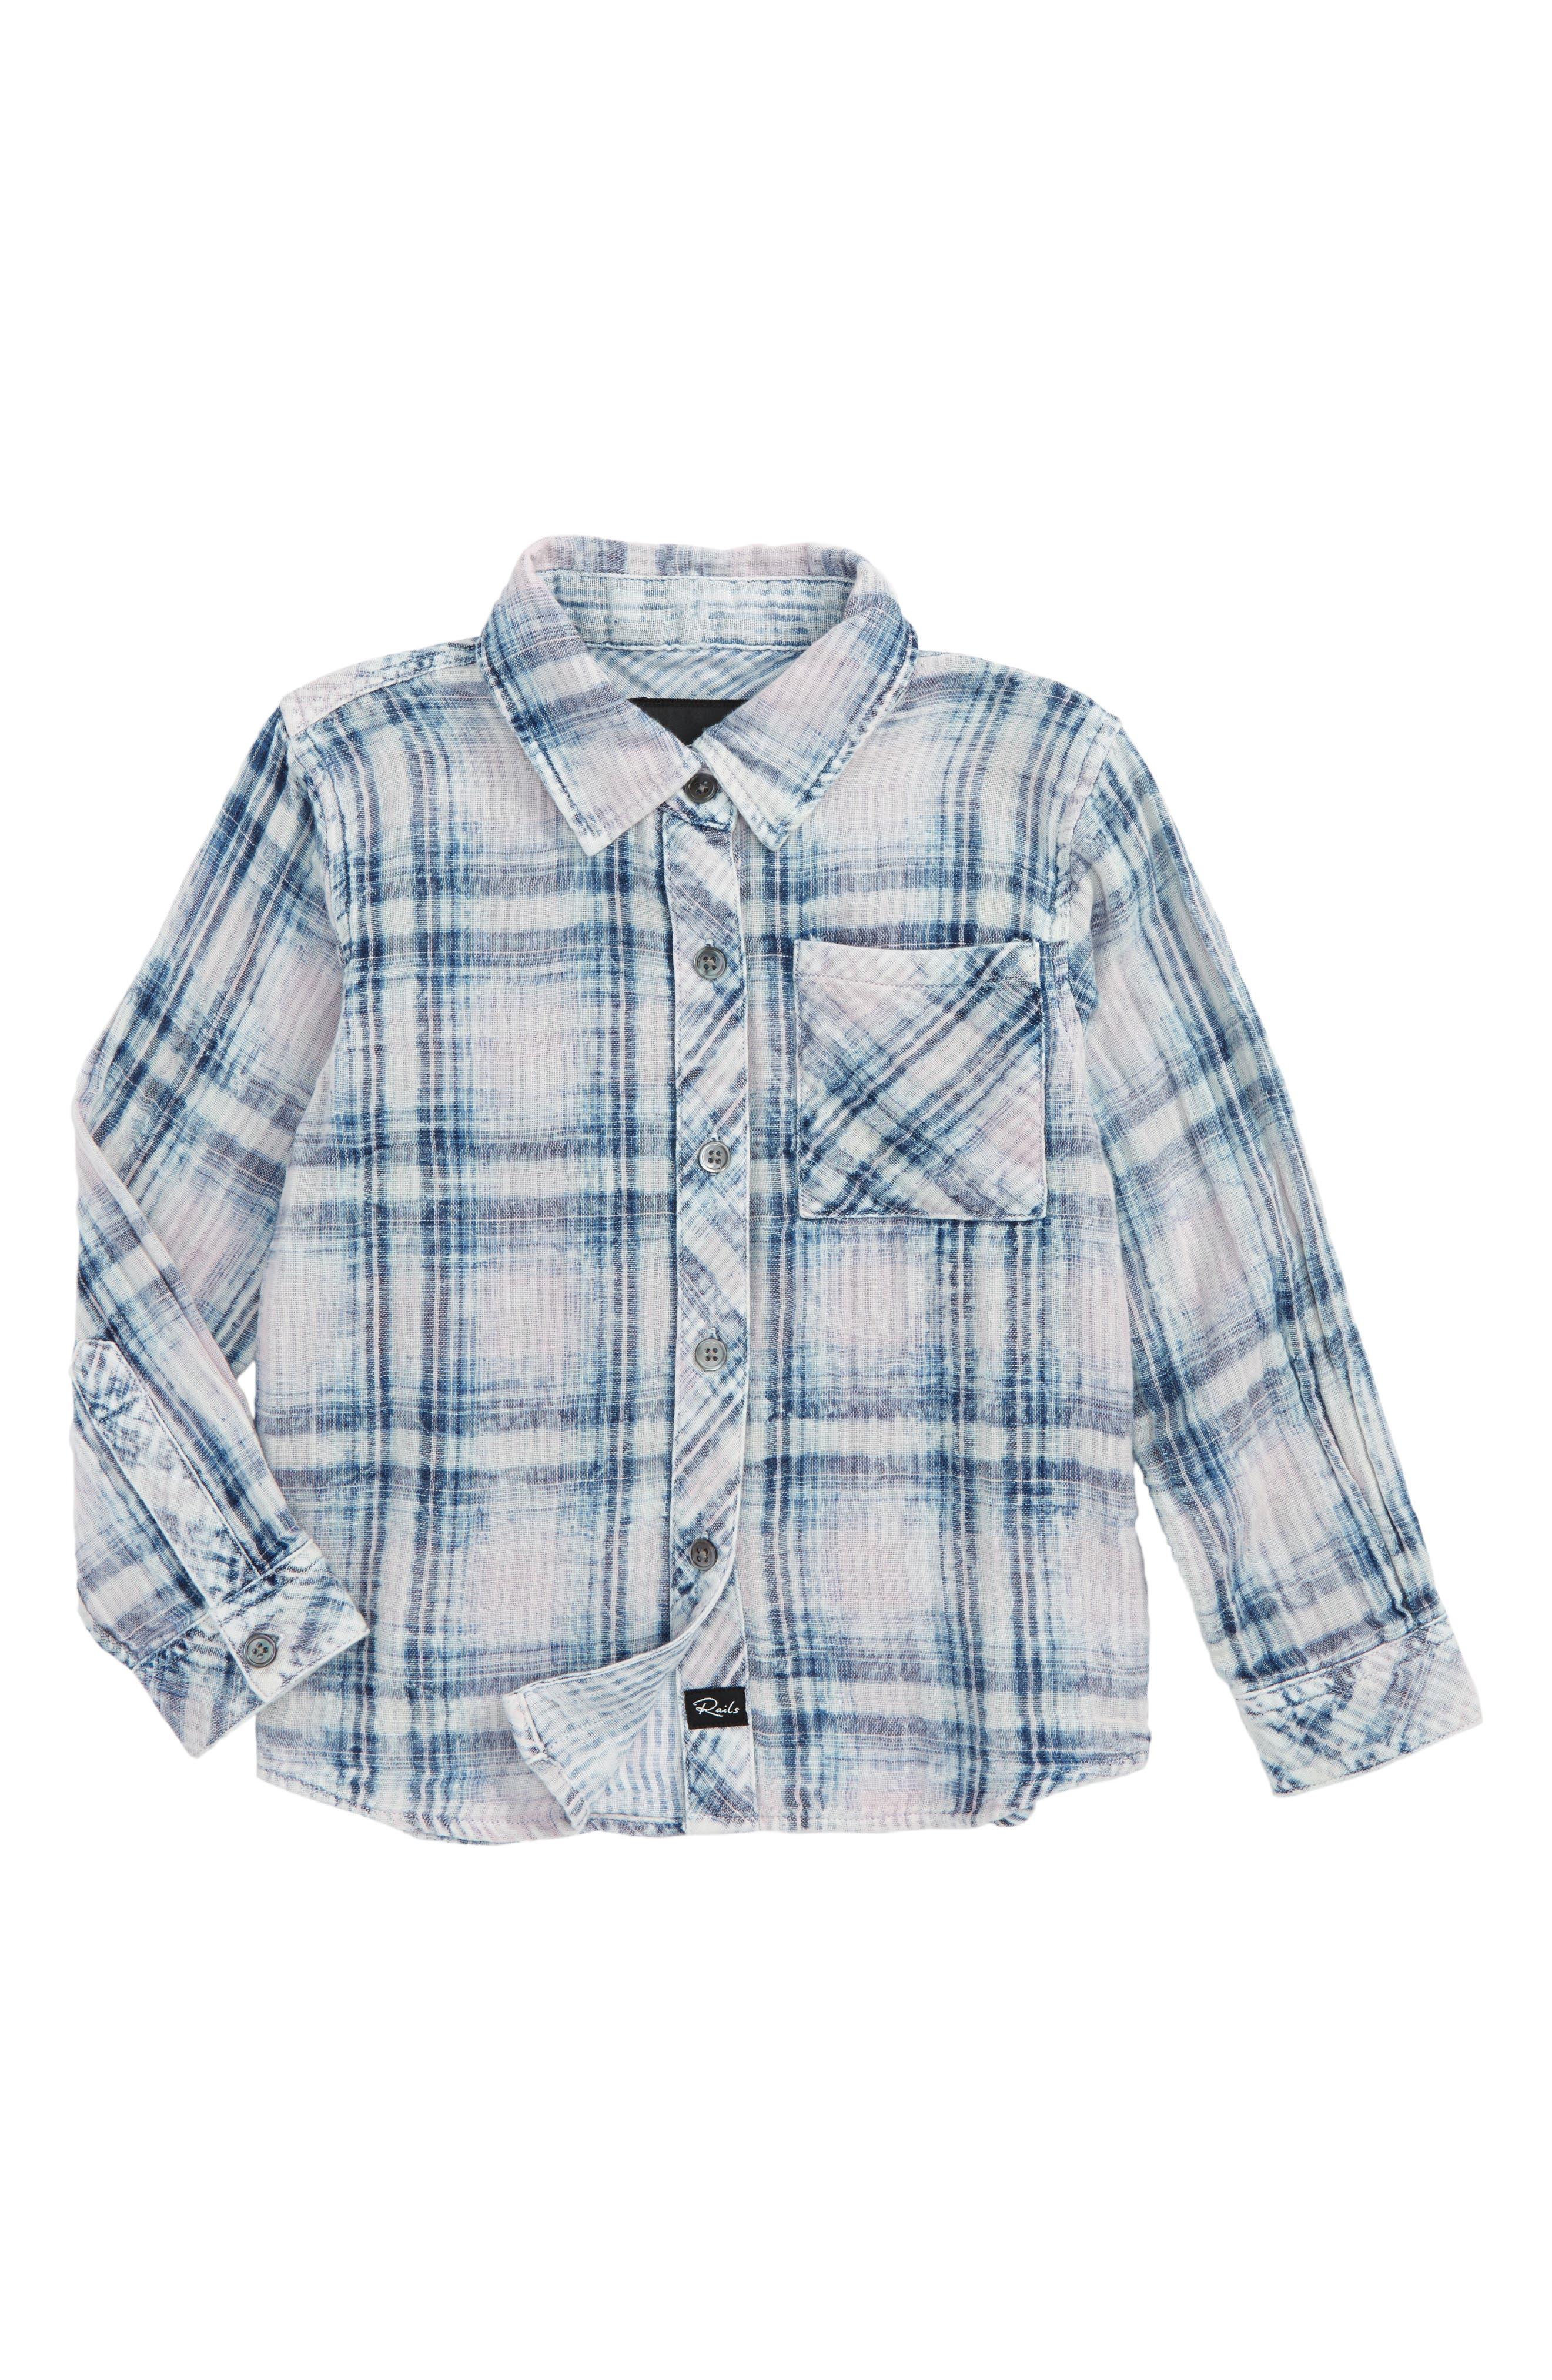 Hudson Plaid Shirt,                             Main thumbnail 1, color,                             400